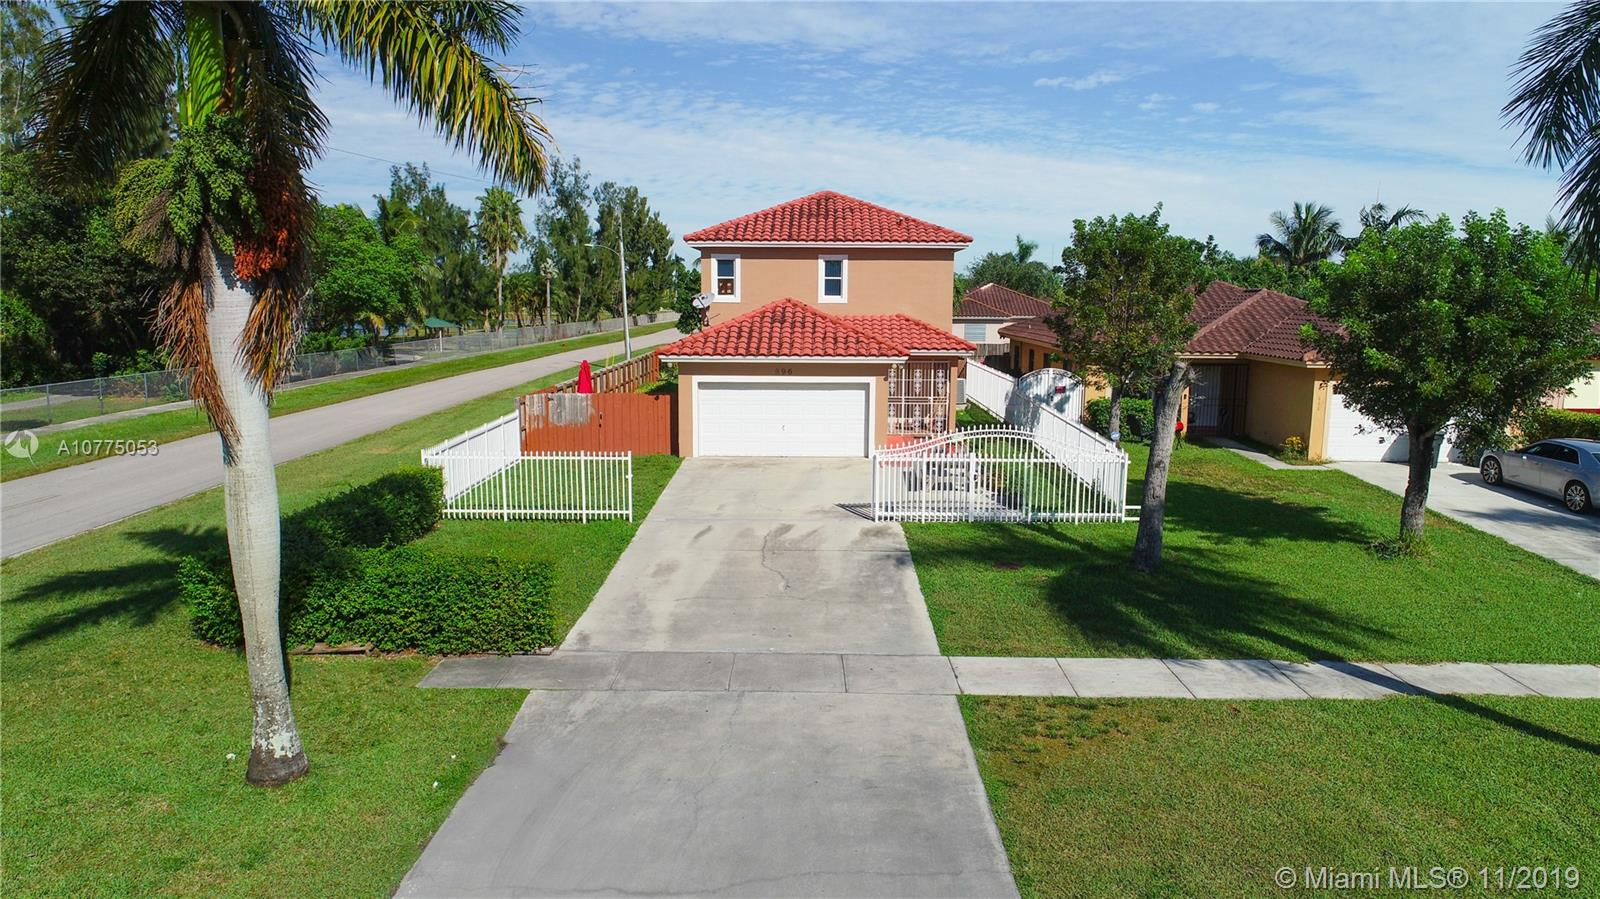 896 SW 7th St, Florida City, FL 33034 - Florida City, FL real estate listing